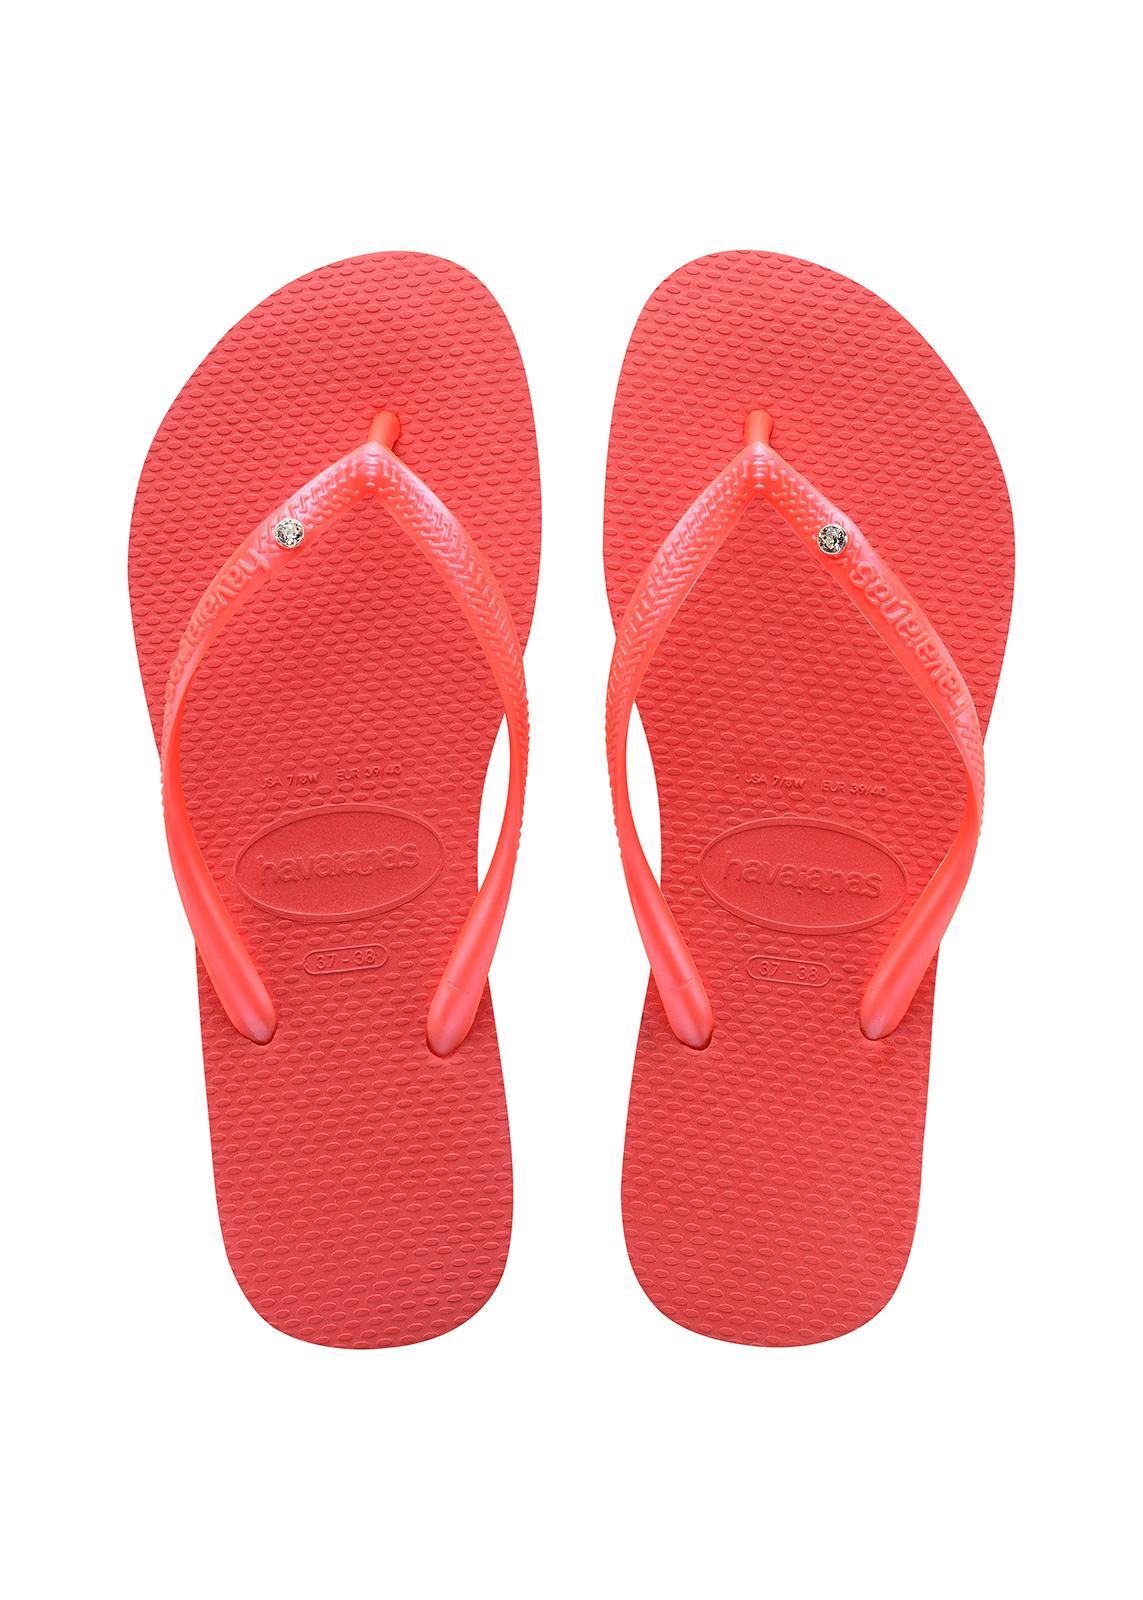 5197c39f5430b1 Flip-Flops Red Flip Flops - Havaianas Slim Crystal Sw Coralnew